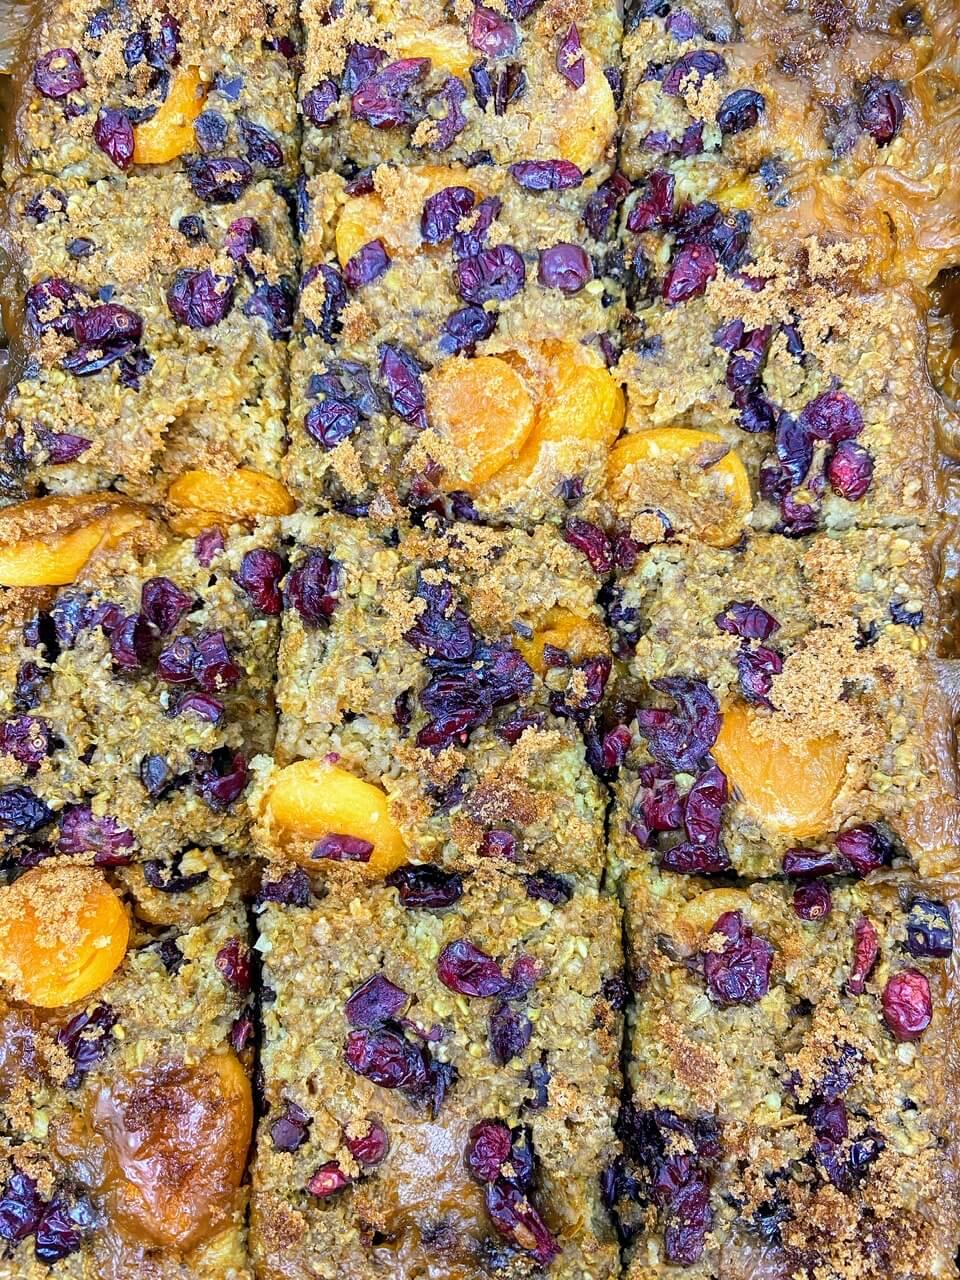 Pantry Items Dried Fruit Oatmeal Bake Non perishable recipe